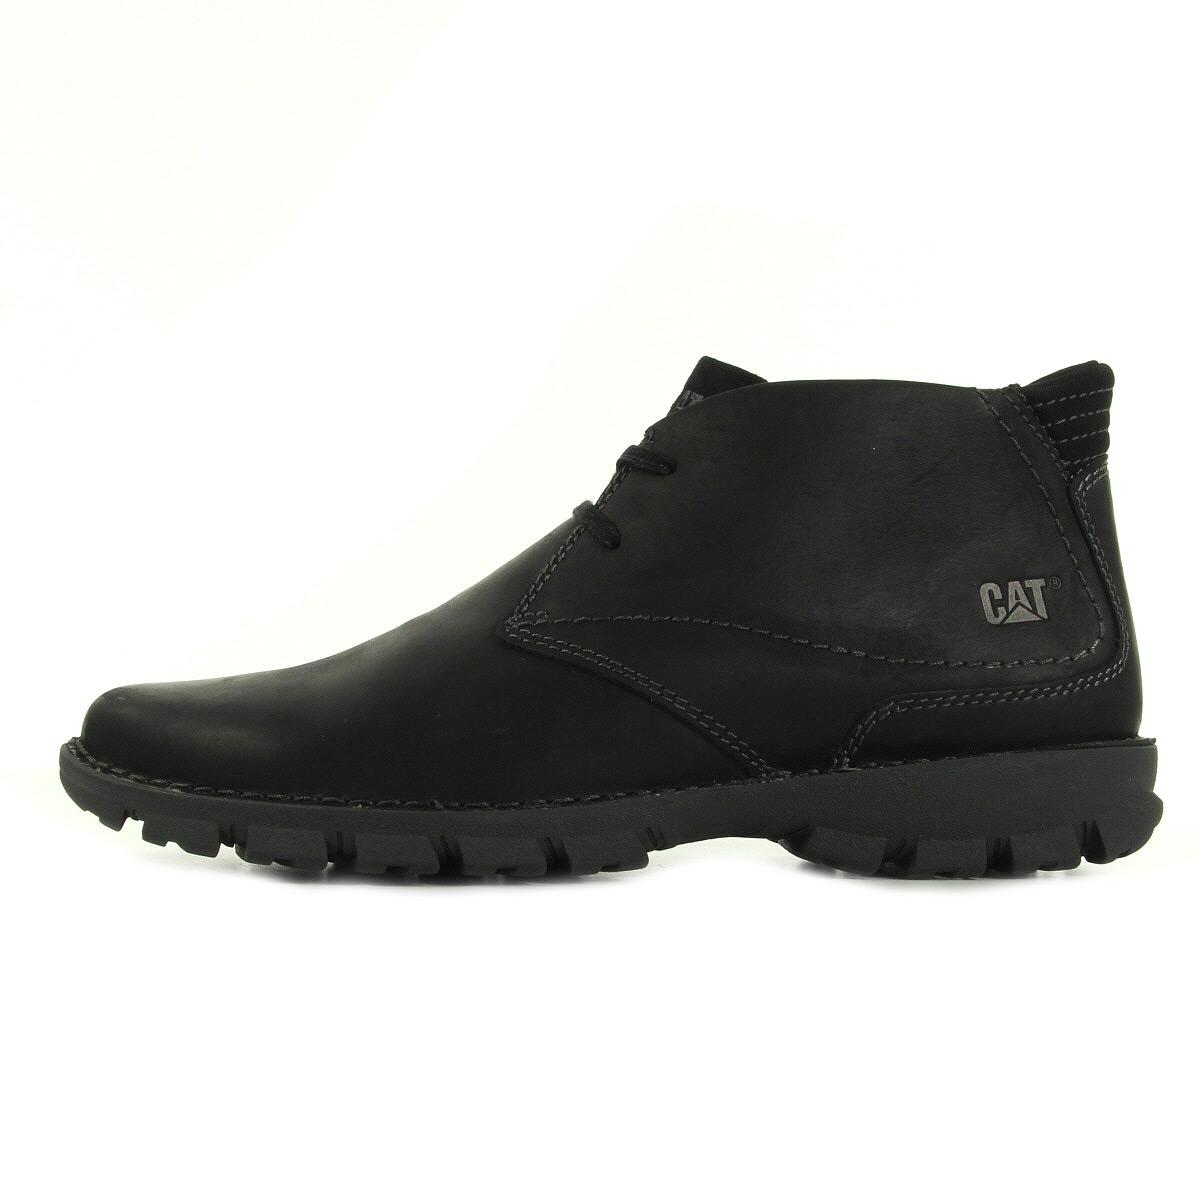 caterpillar mitch black p720653 chaussures homme homme. Black Bedroom Furniture Sets. Home Design Ideas